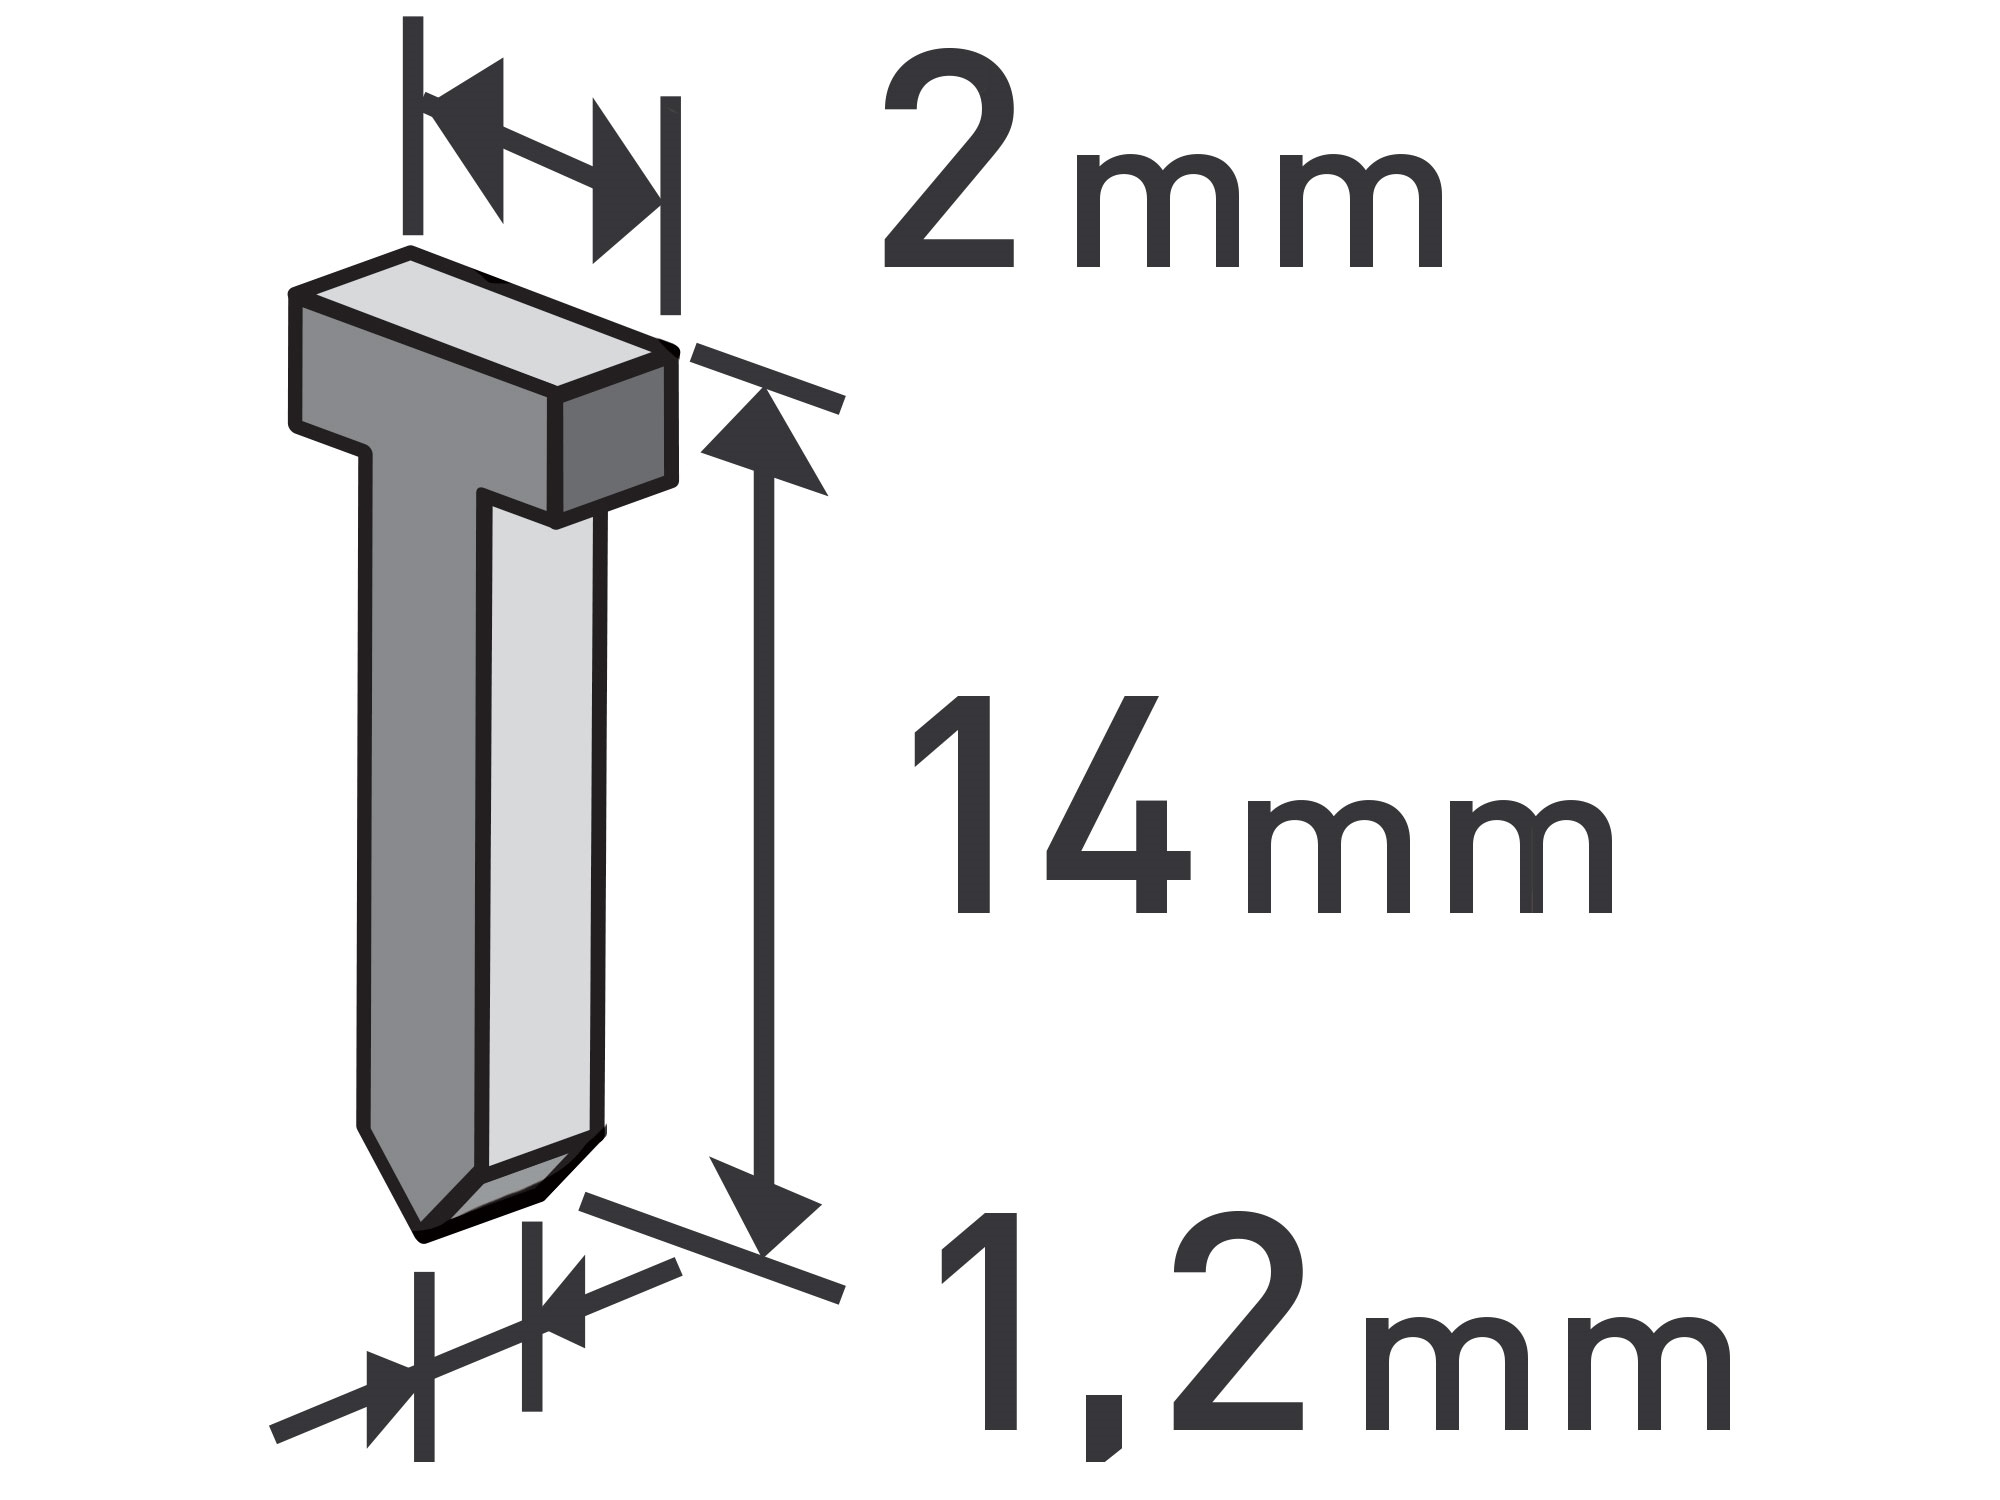 hřebíky, balení 1000ks, 14mm, 2,0x0,52x1,2mm, EXTOL PREMIUM 8852405